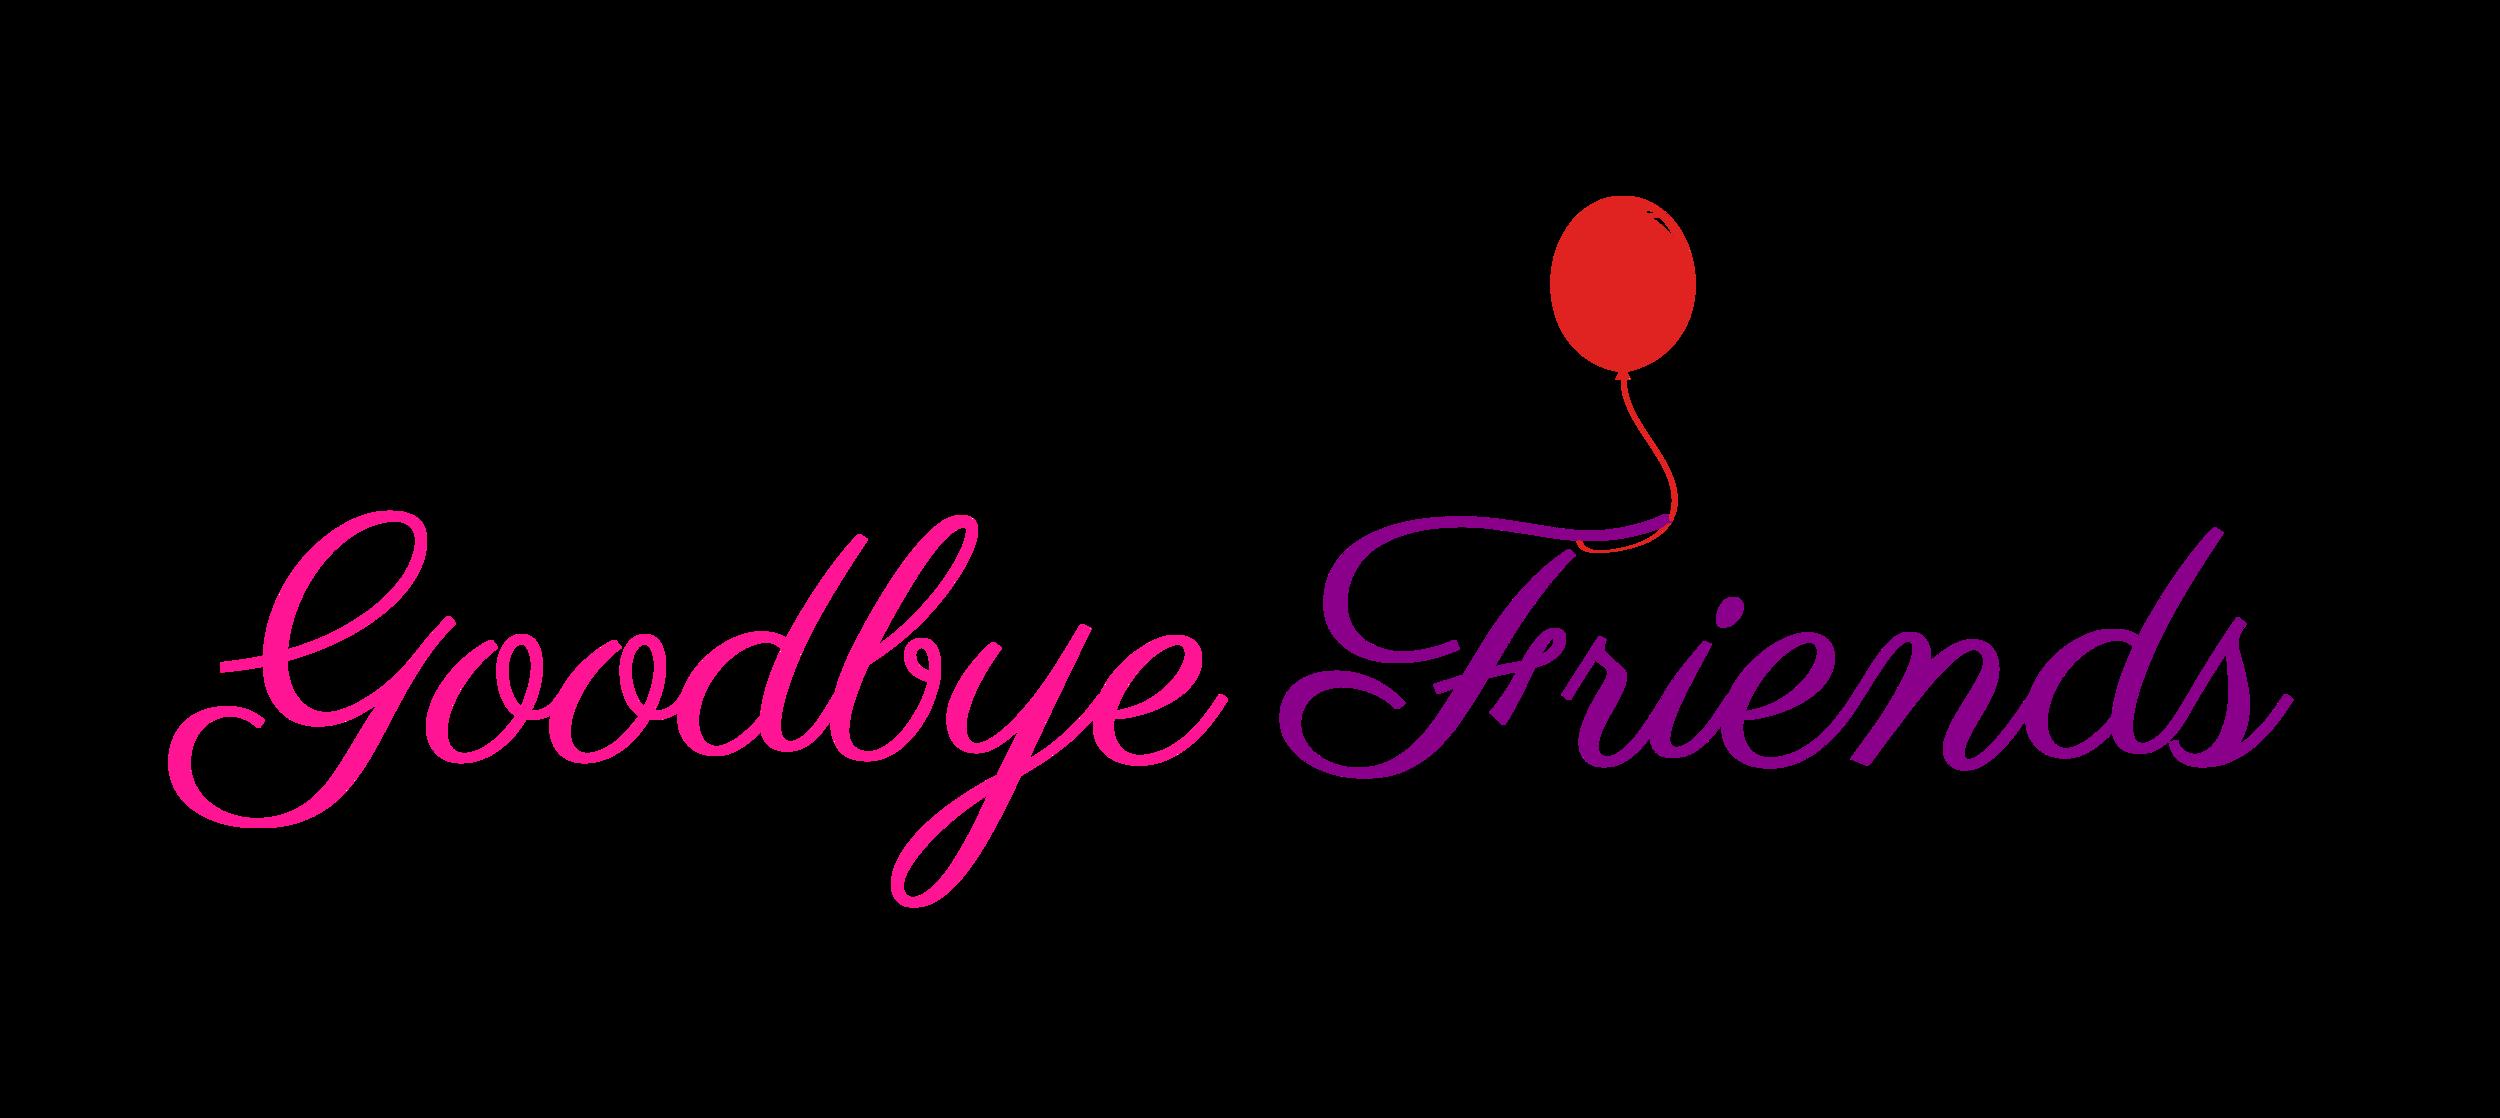 Goodbye-logo (1).png